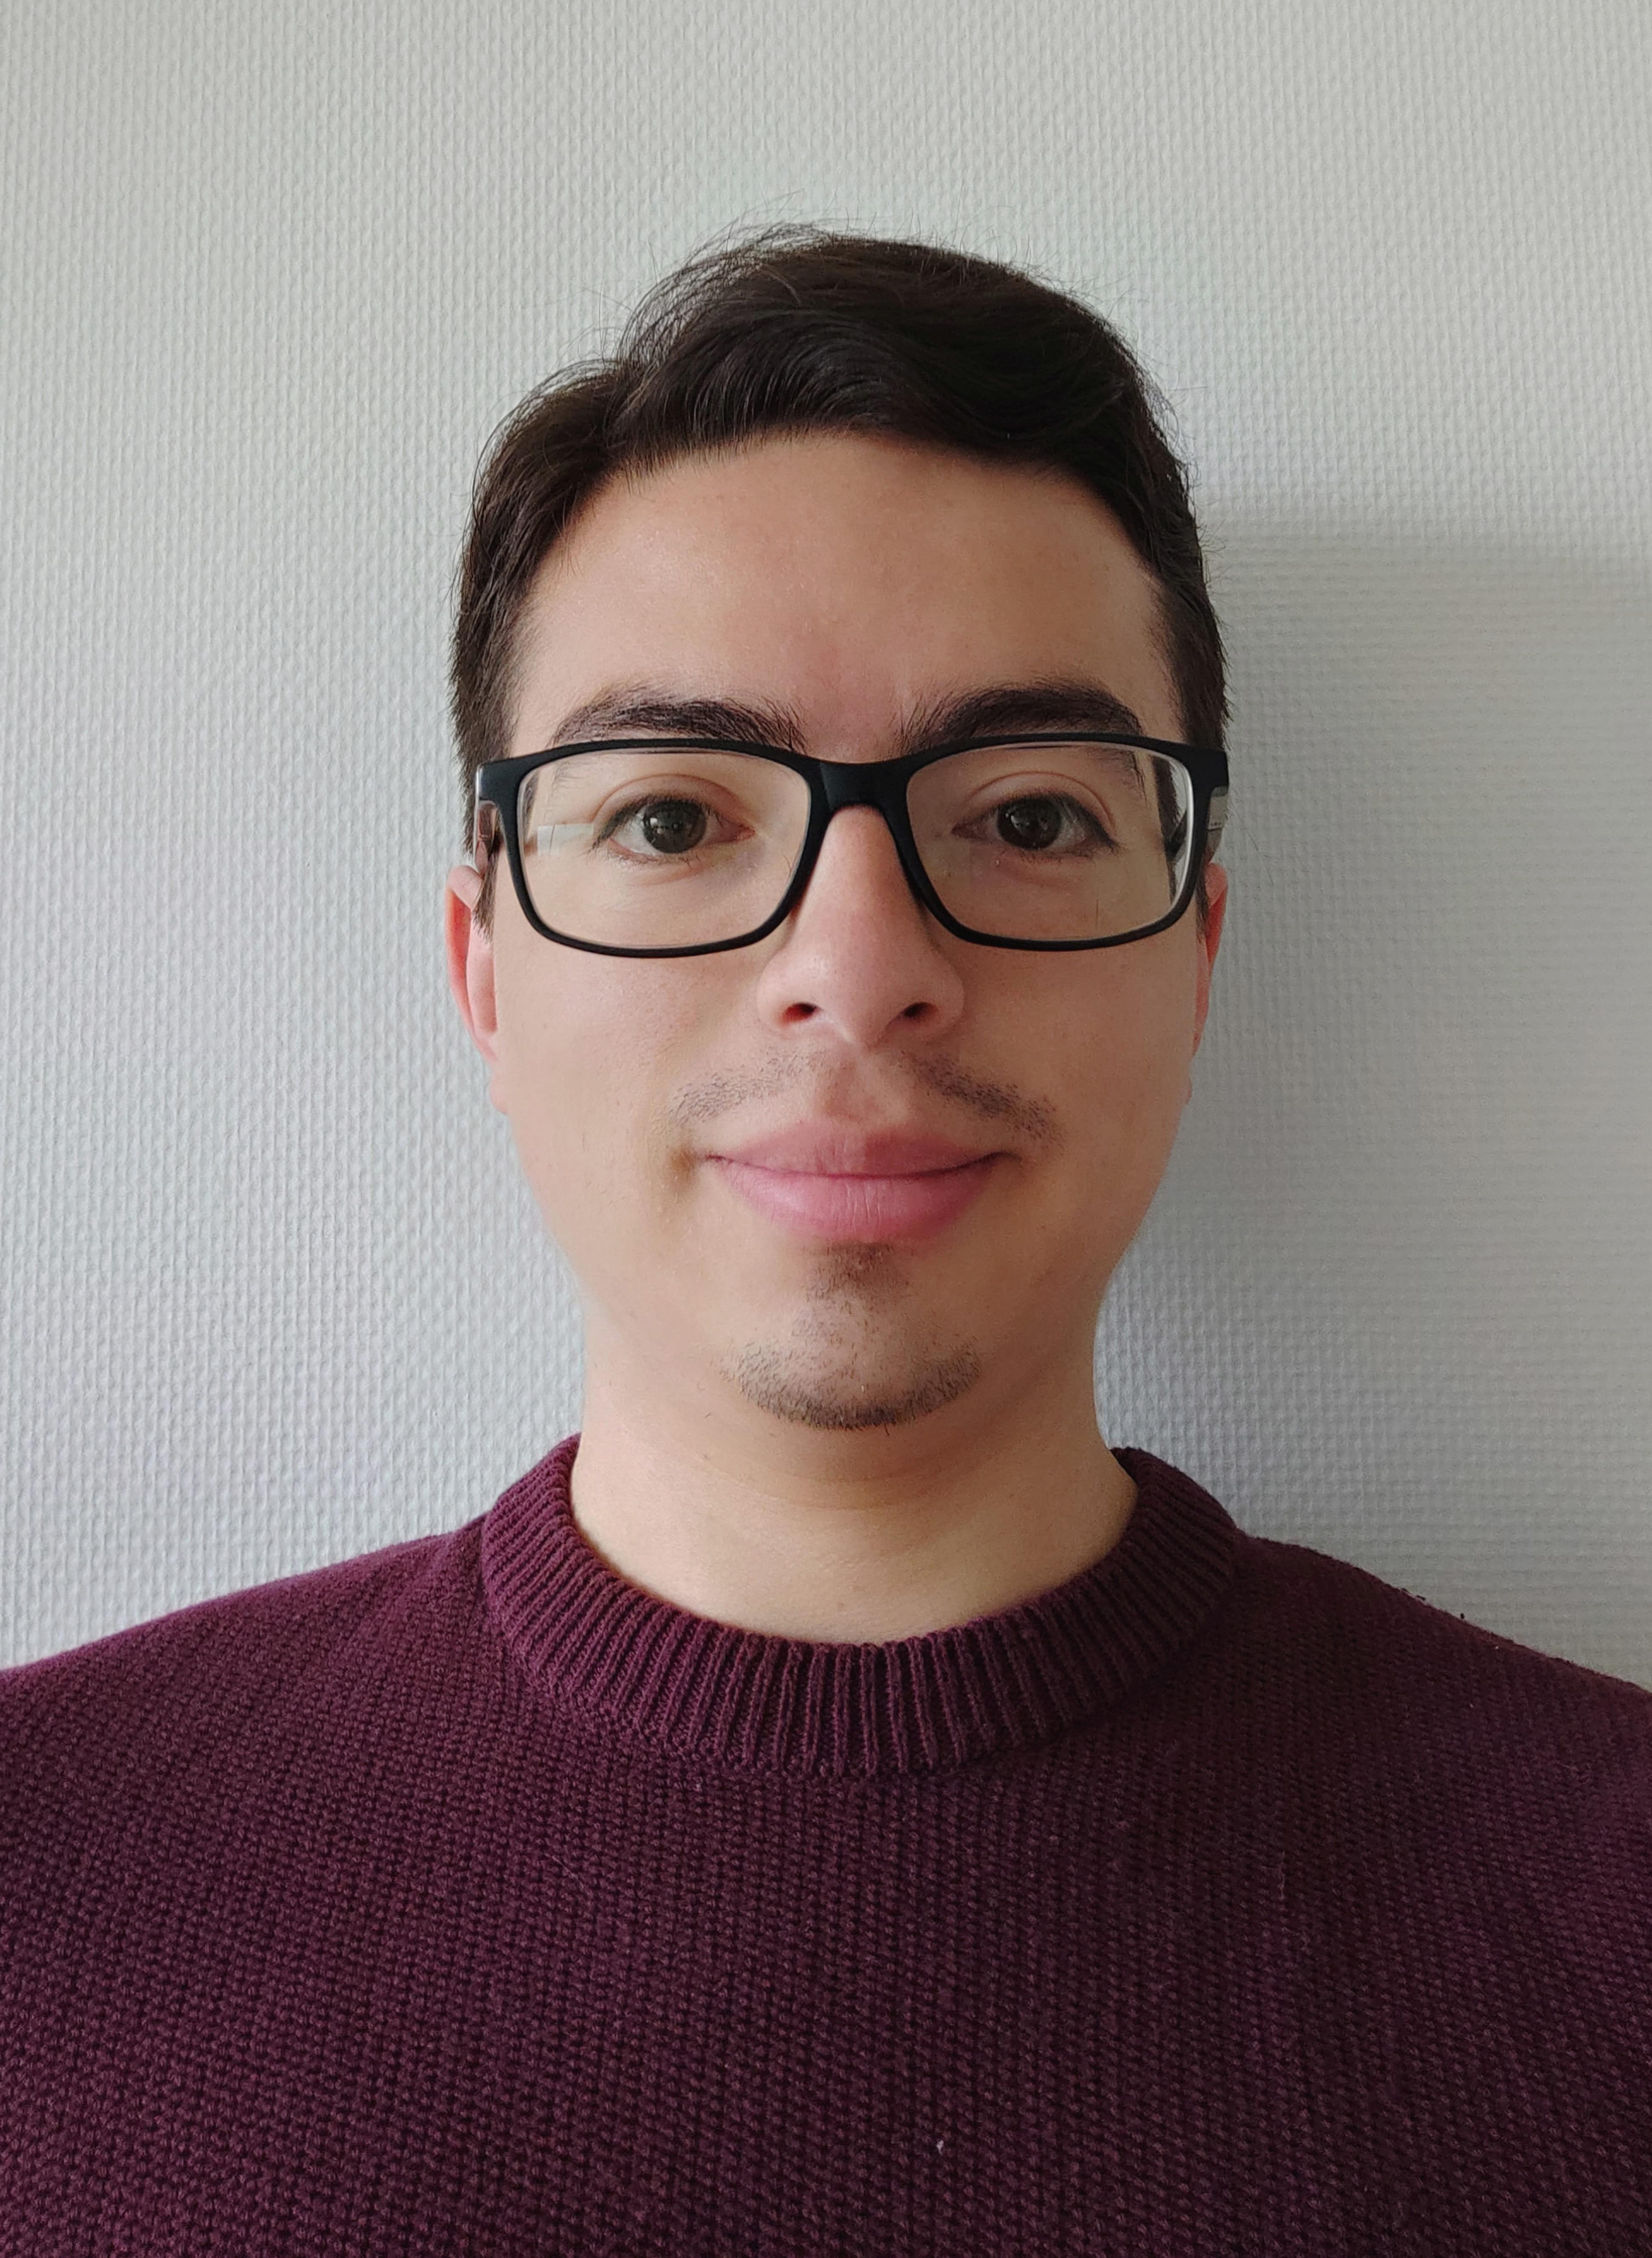 Paúl Ubillús profile pic